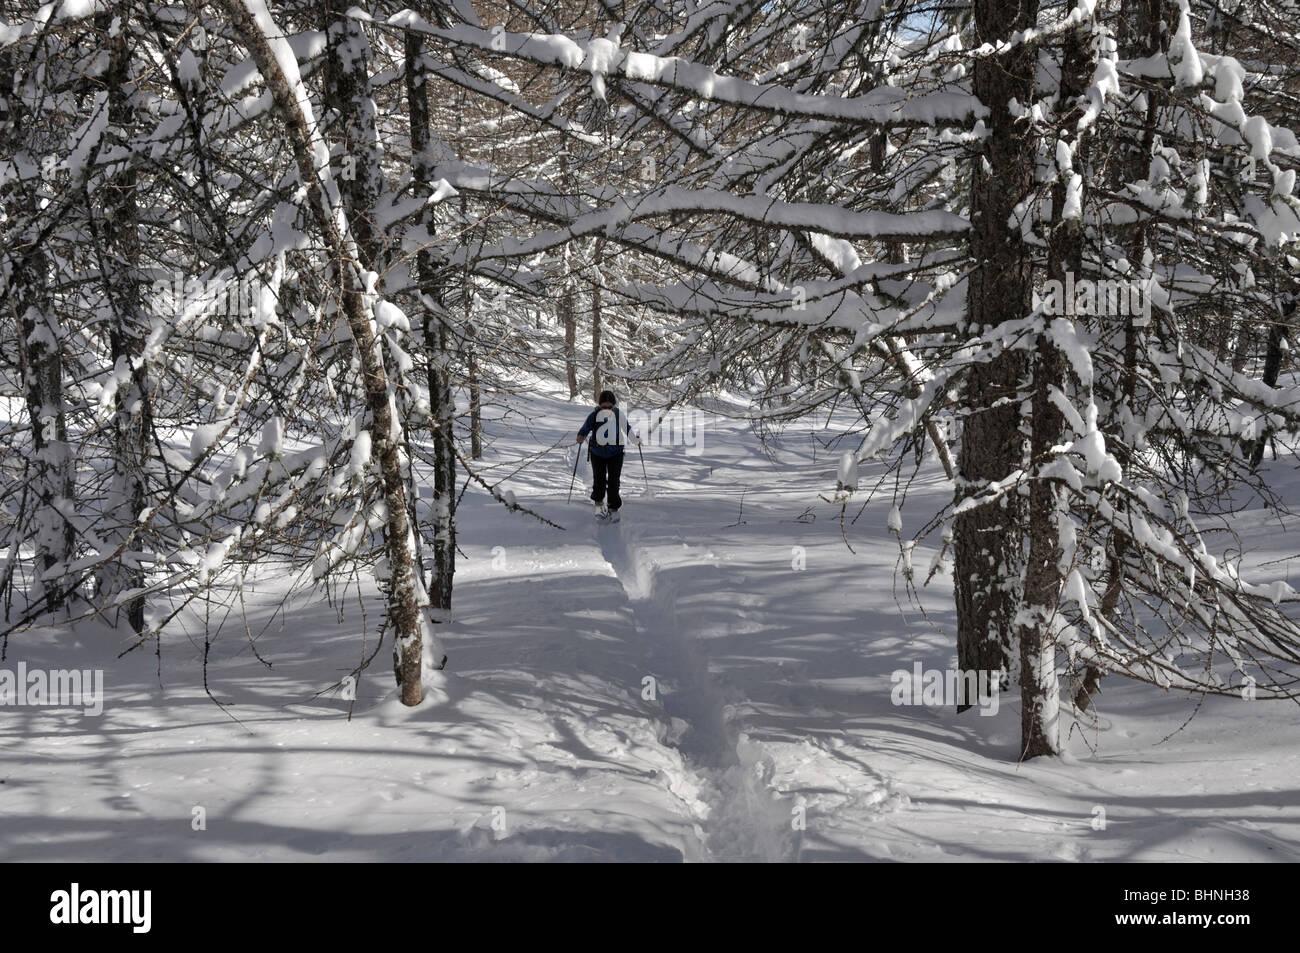 Snowshoeing in Vallon de Caramagne, near Tende, Mercantour Alps, France - Stock Image